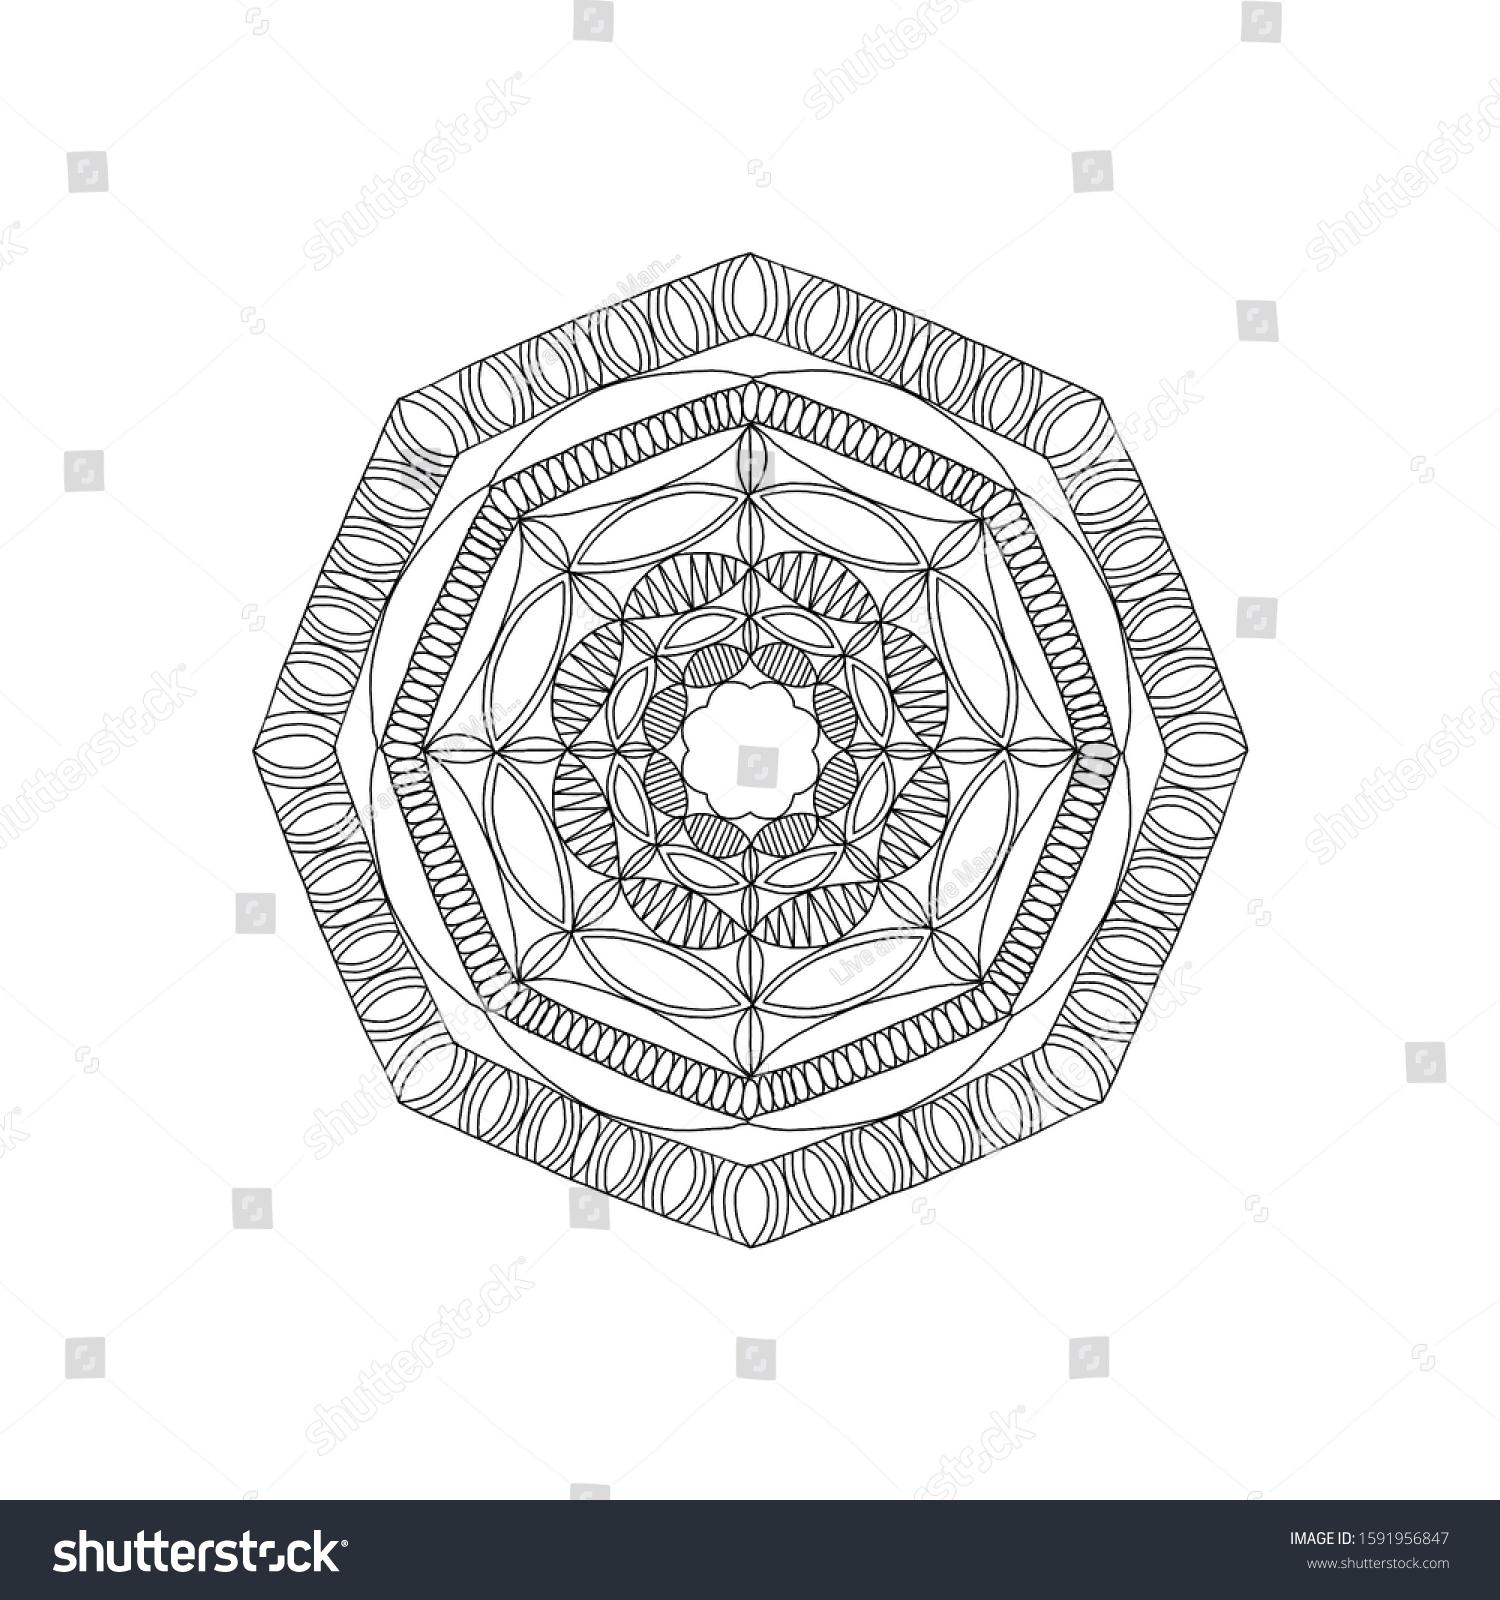 Mandala Designs Mandala Illustration Mandala Coloring ...